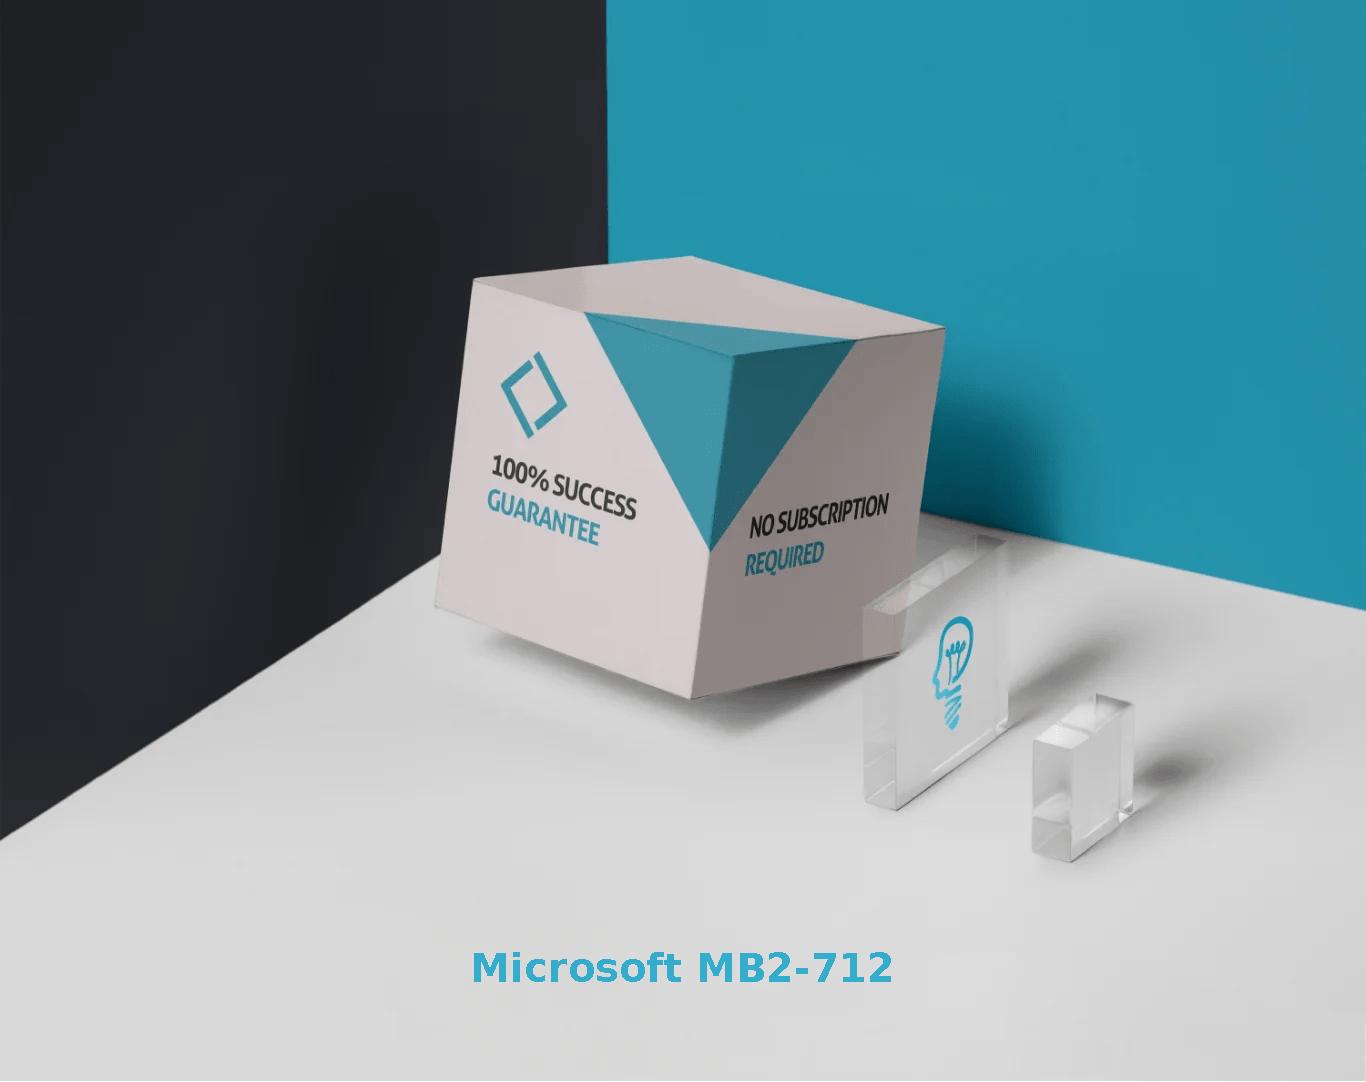 Microsoft MB2-712 Exams